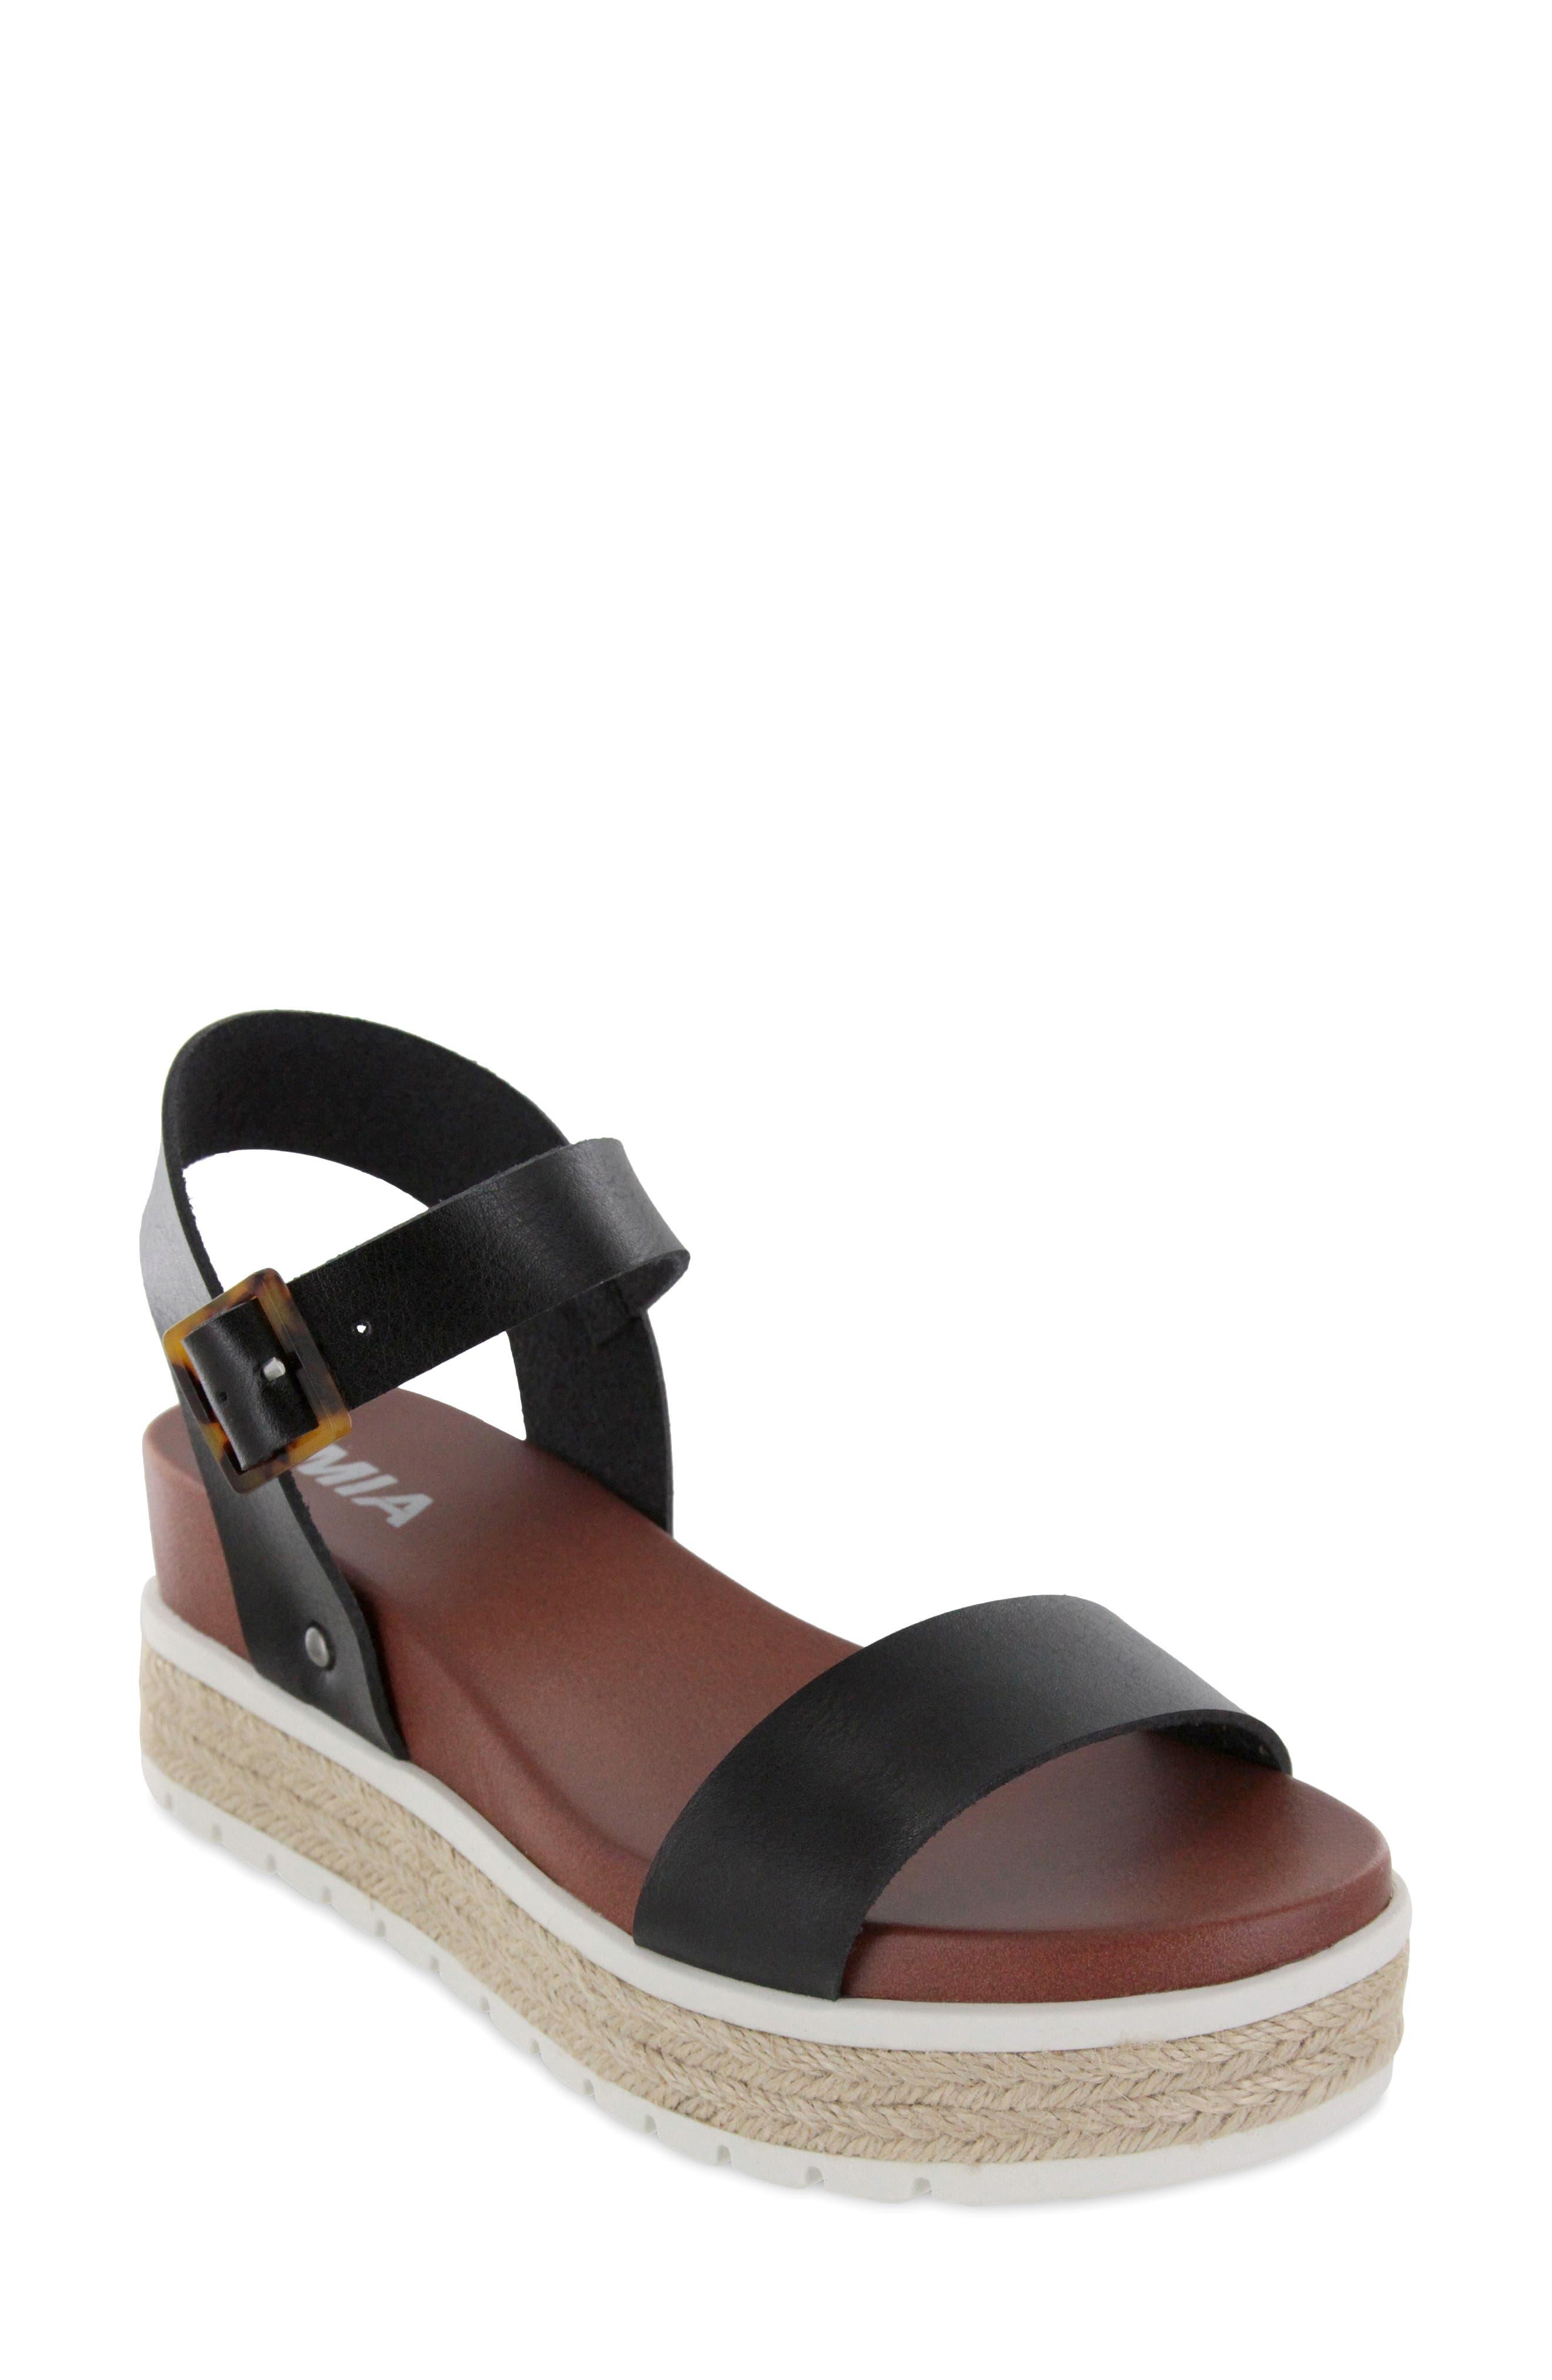 Kiera Espadrille Platform Sandal